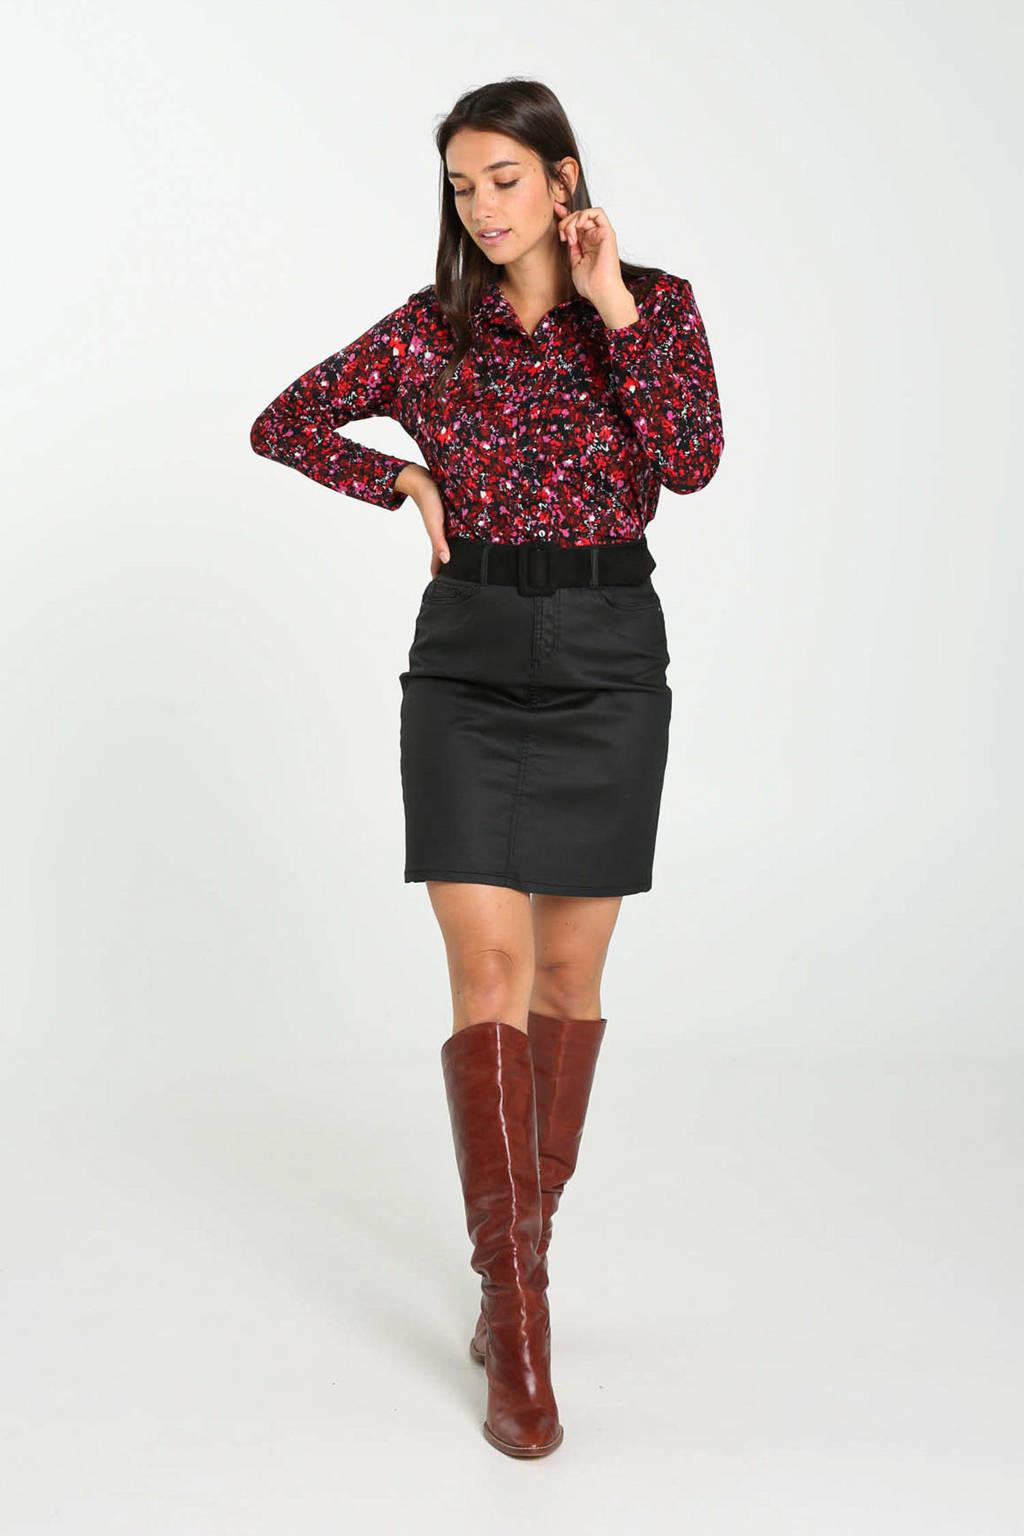 Cassis gebloemde blouse rood/zwart/roze, Rood/zwart/roze